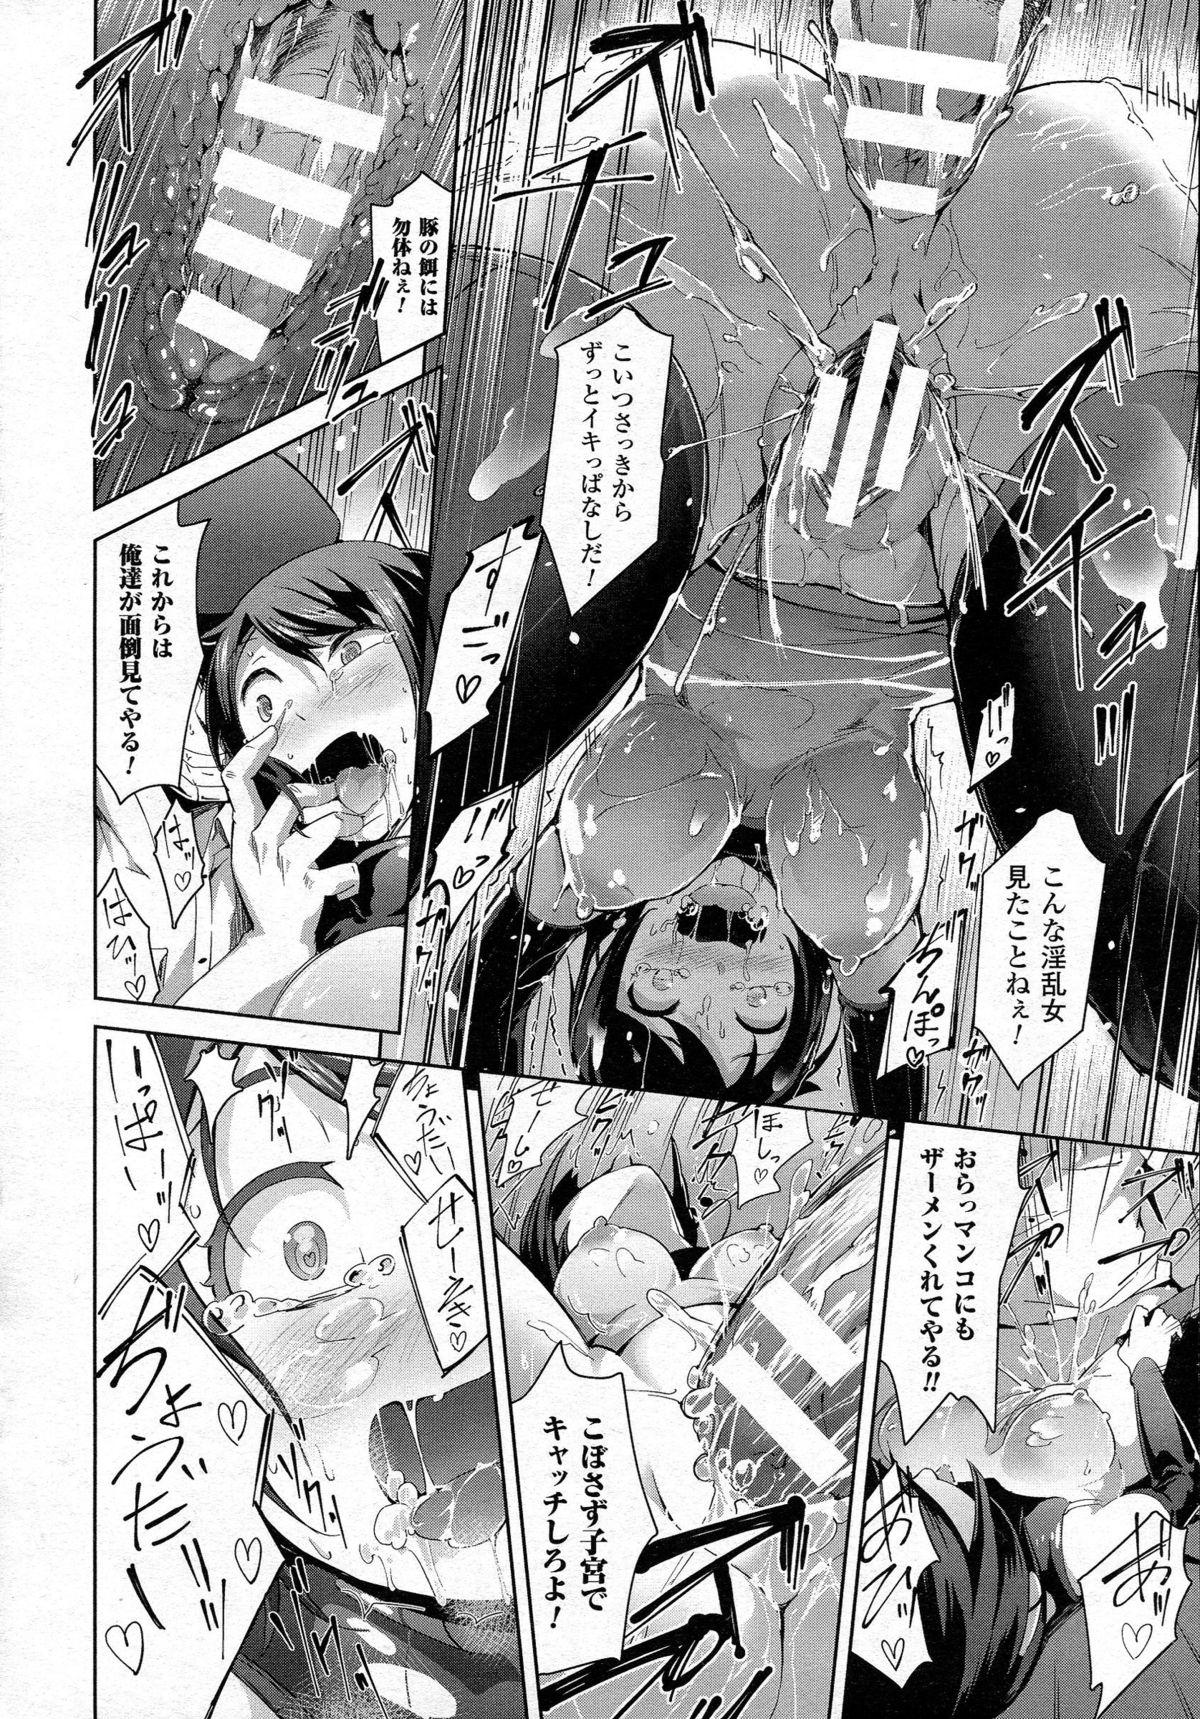 COMIC Unreal 2015-06 Vol. 55 + Hisasi Illust Shuu 407